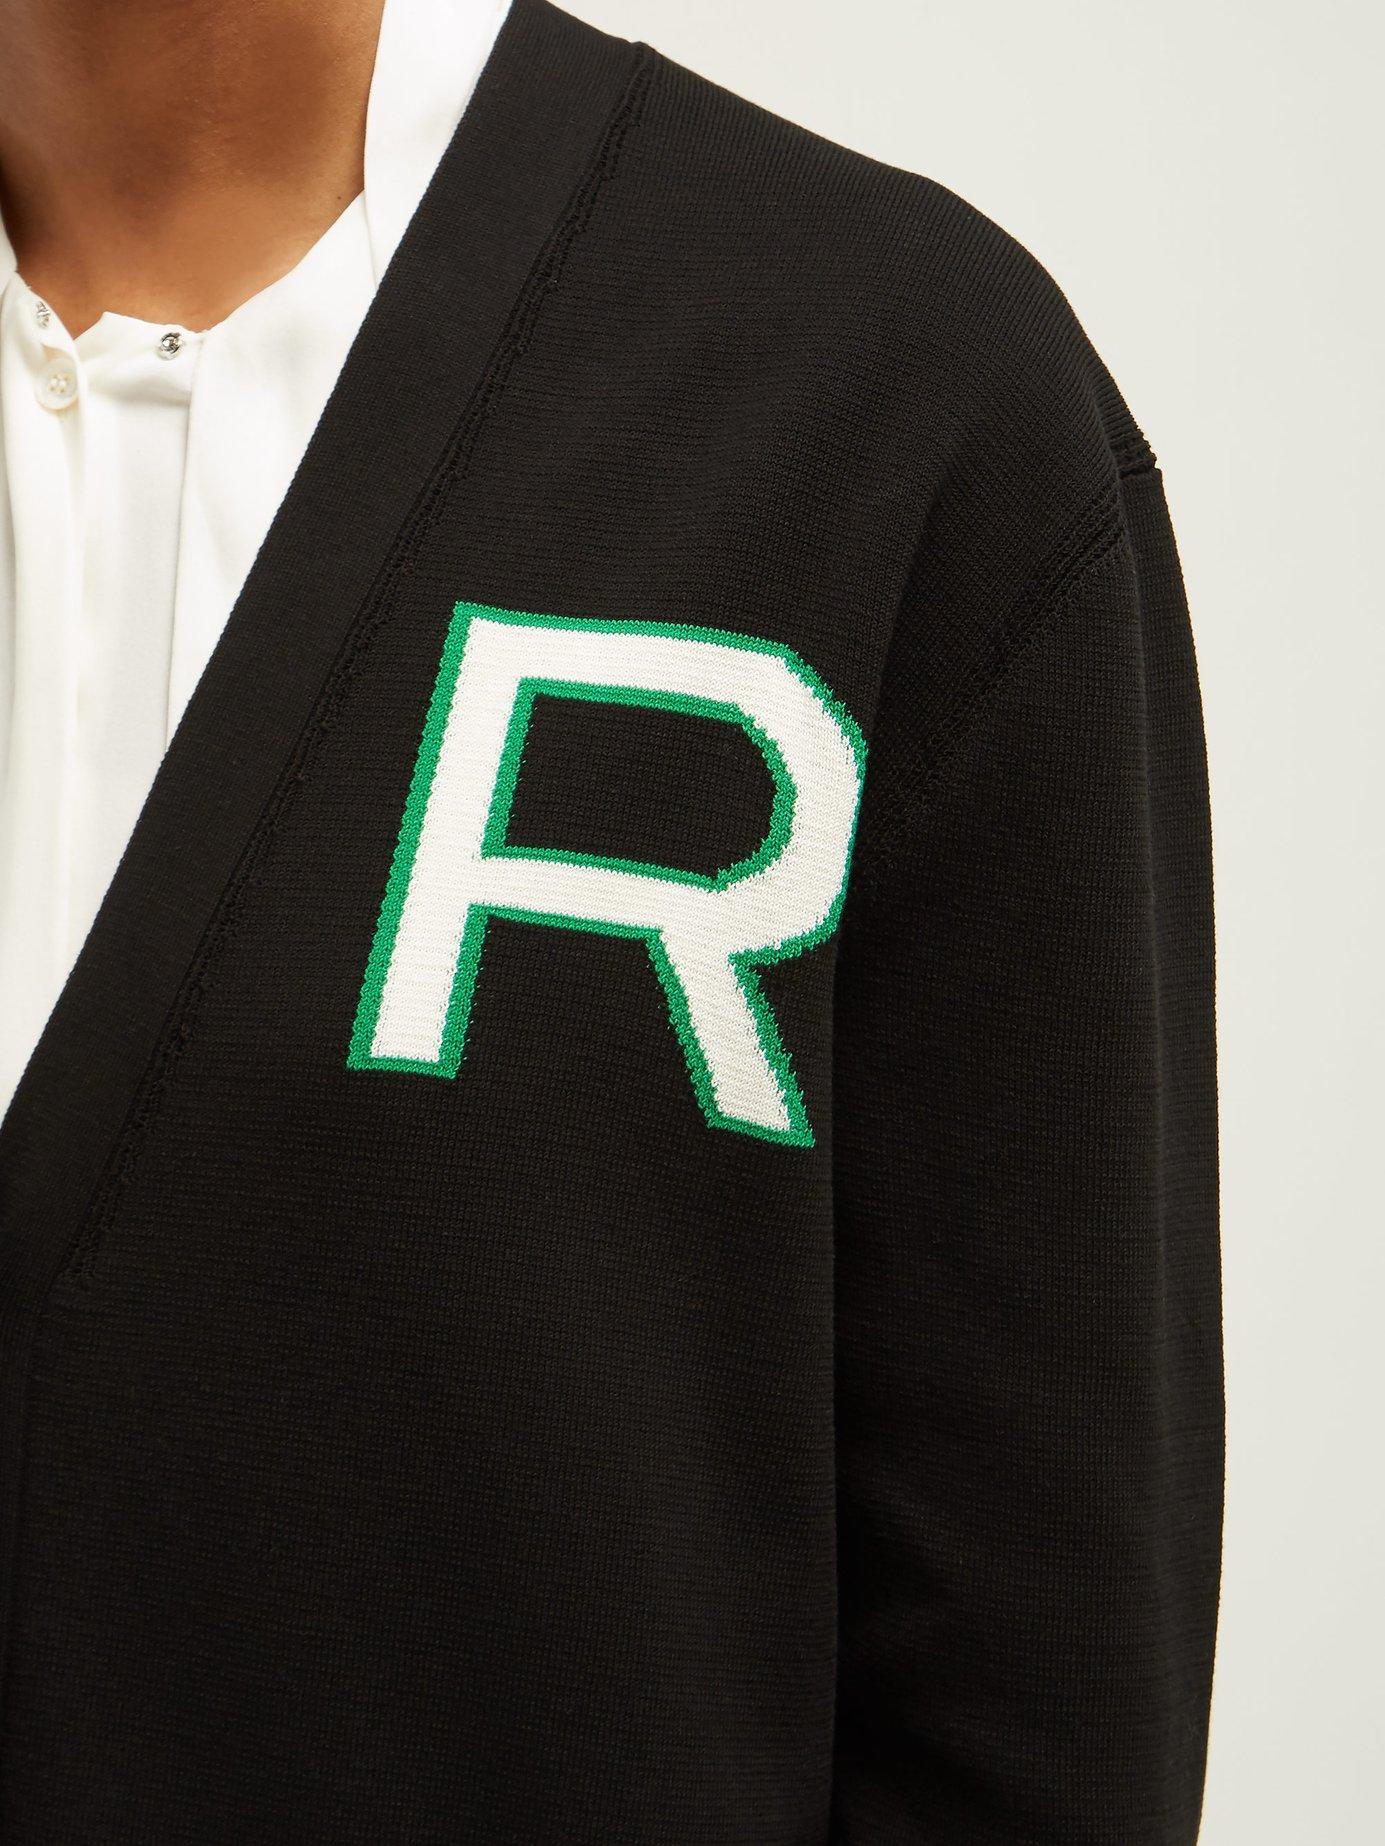 2beff9ad18 Rochas - Black Logo Intarsia Knitted Cotton Cardigan - Lyst. View fullscreen